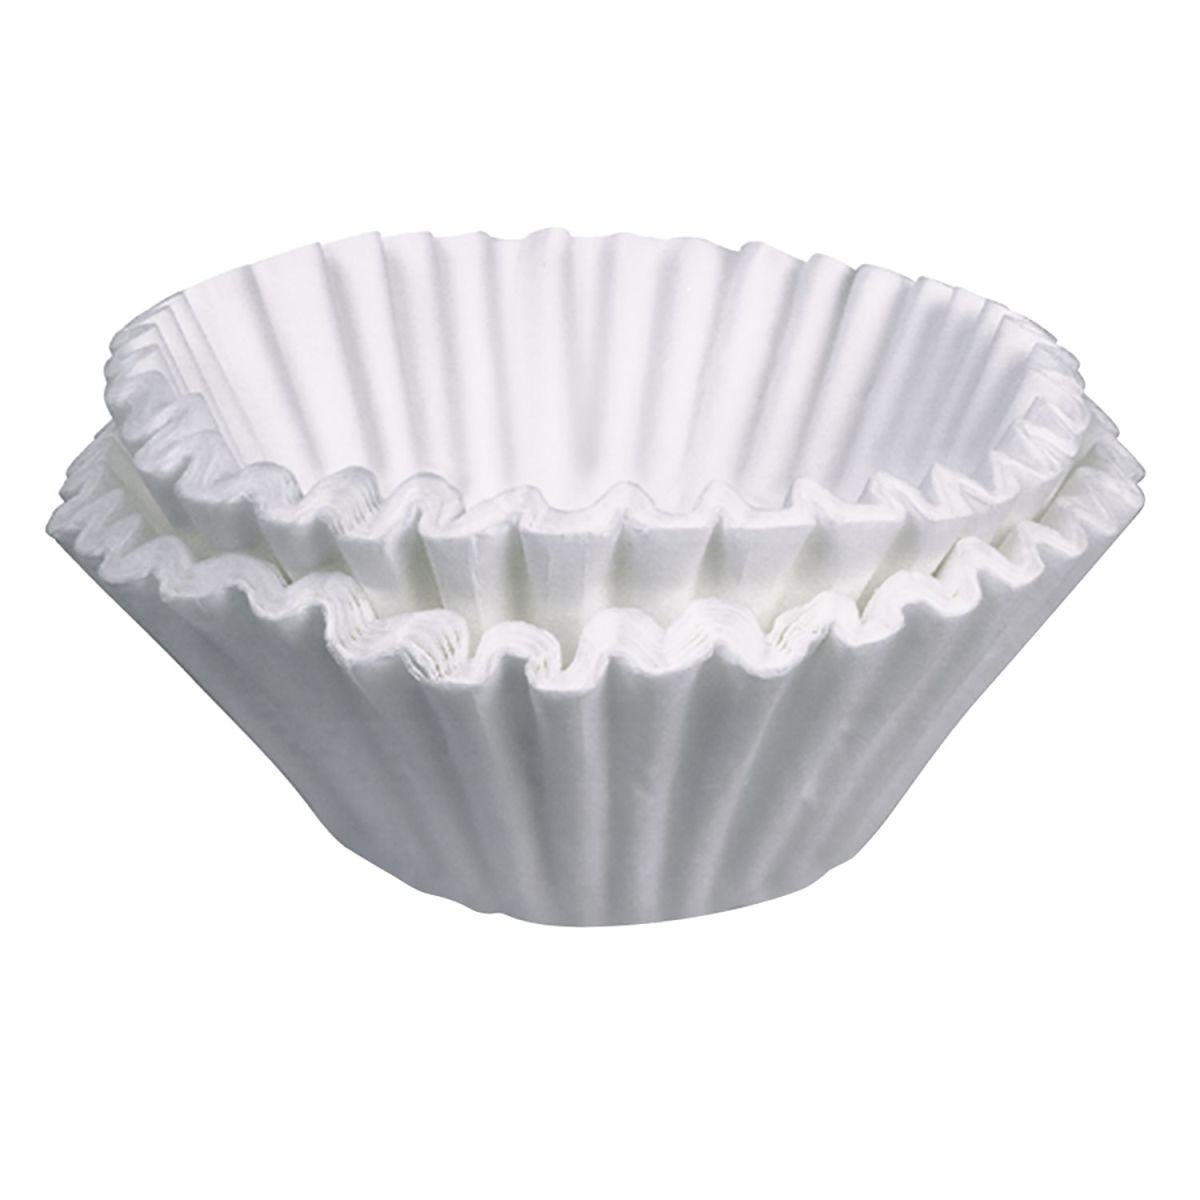 Urn -10Gal (37.9L) Paper Filters 250/cs